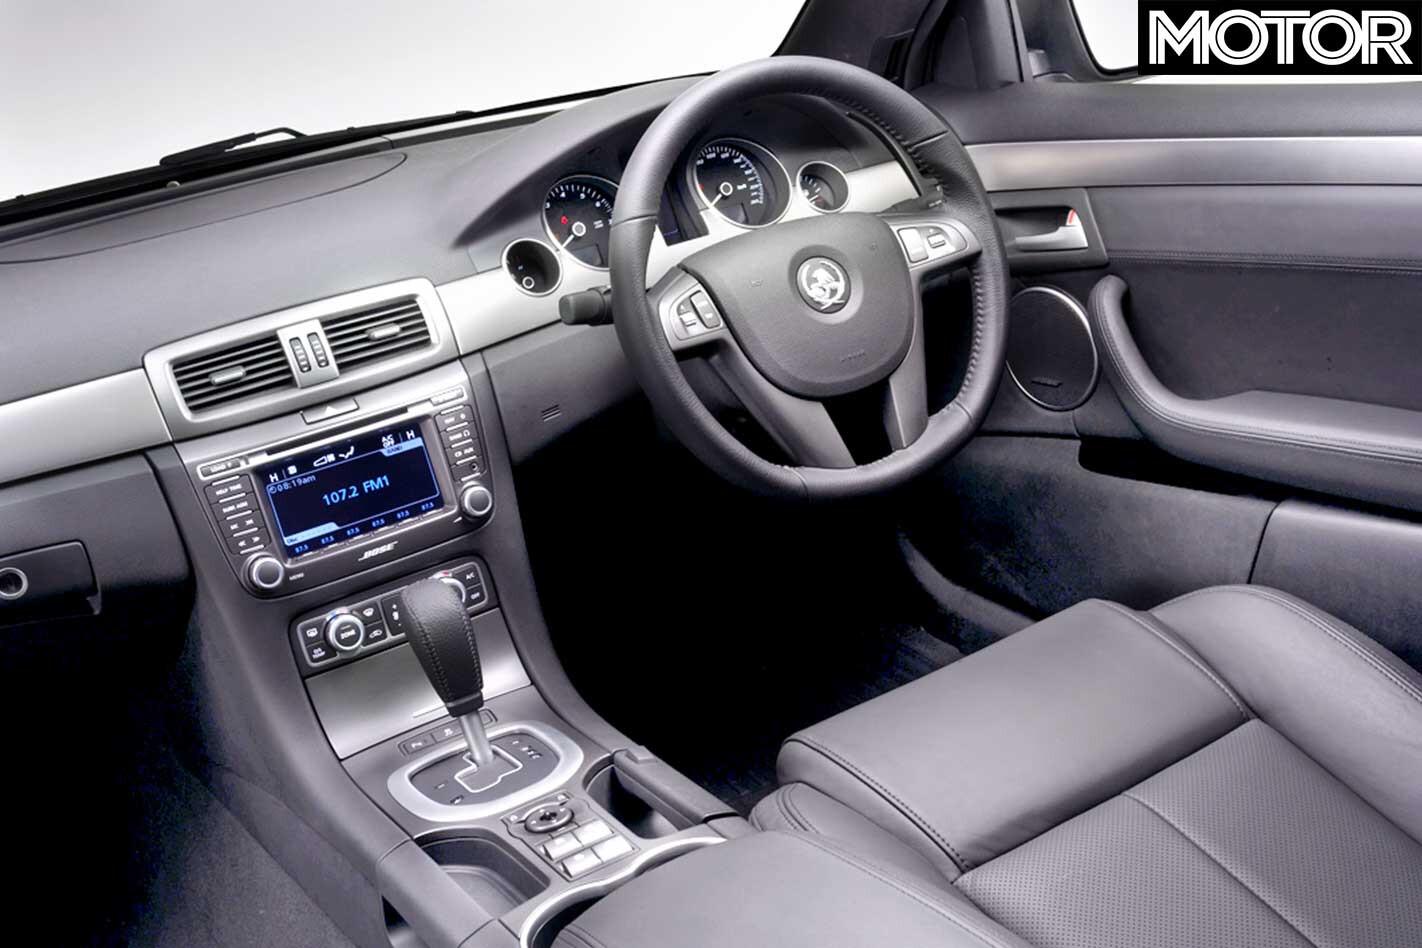 2006 Holden WM Caprice Interior Jpg